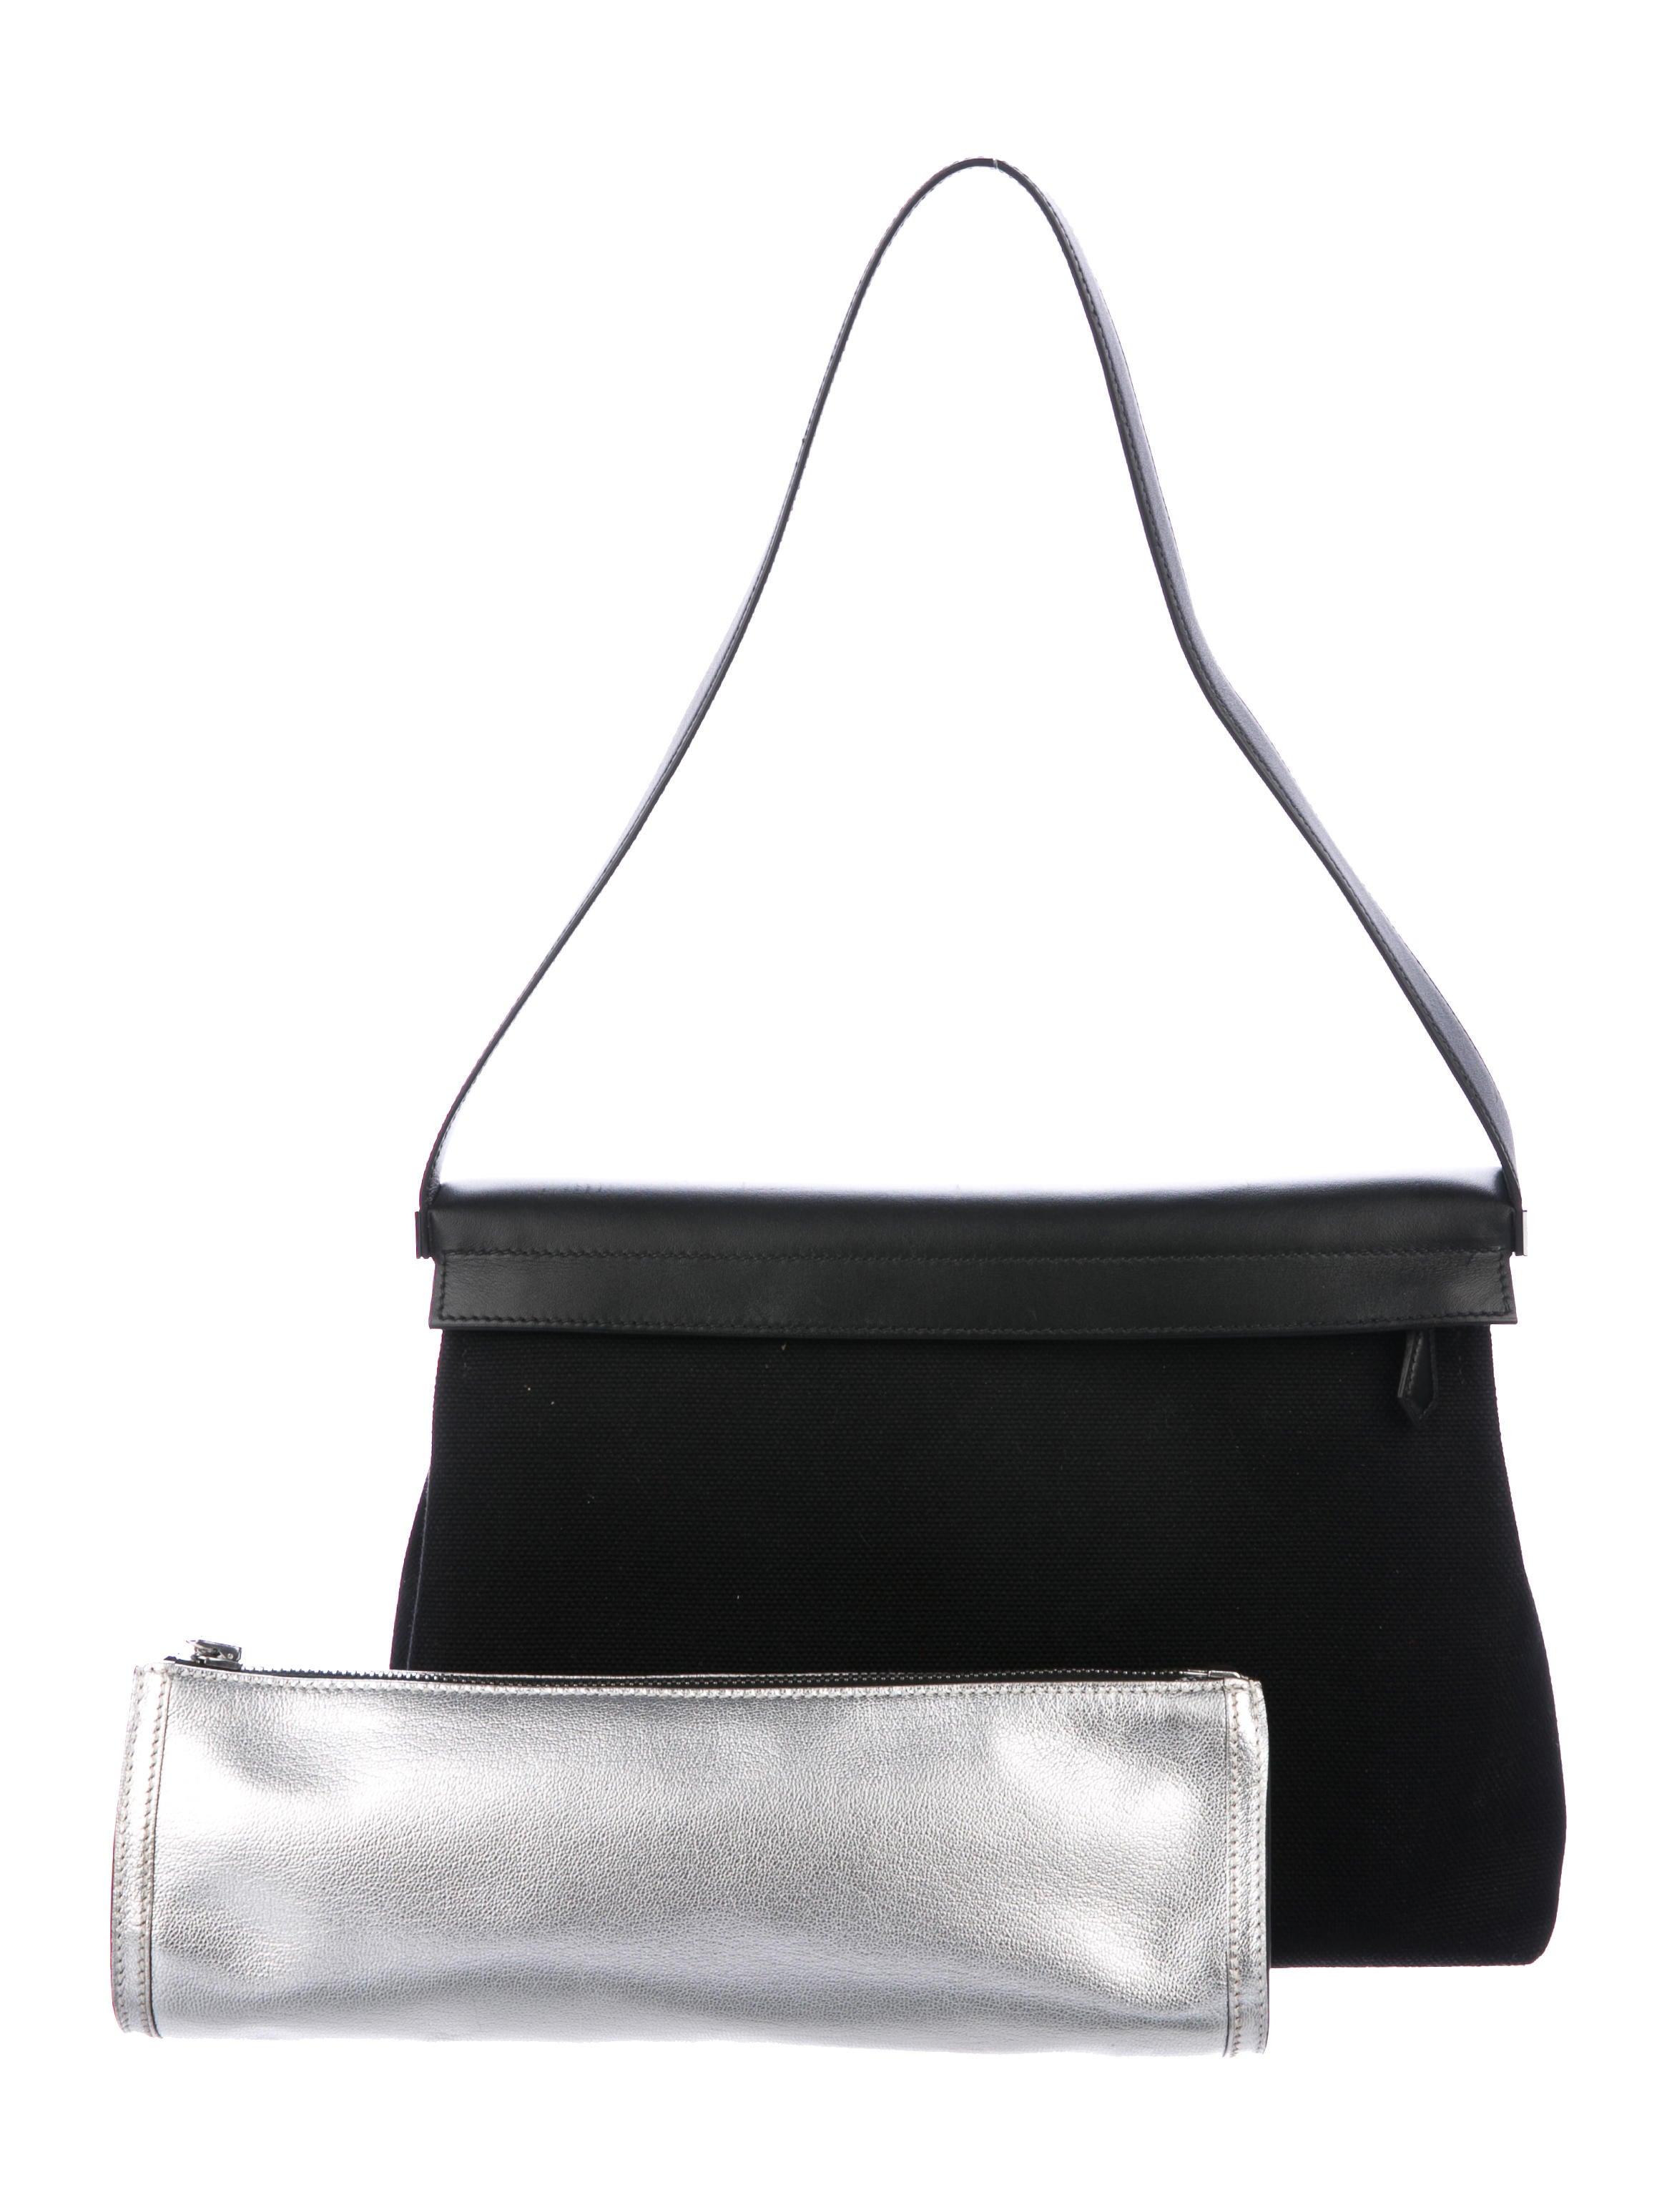 f8077f126891 ... wholesale hermès yeoh bag handbags her125314 the realreal 7b940 0b5c3  ...